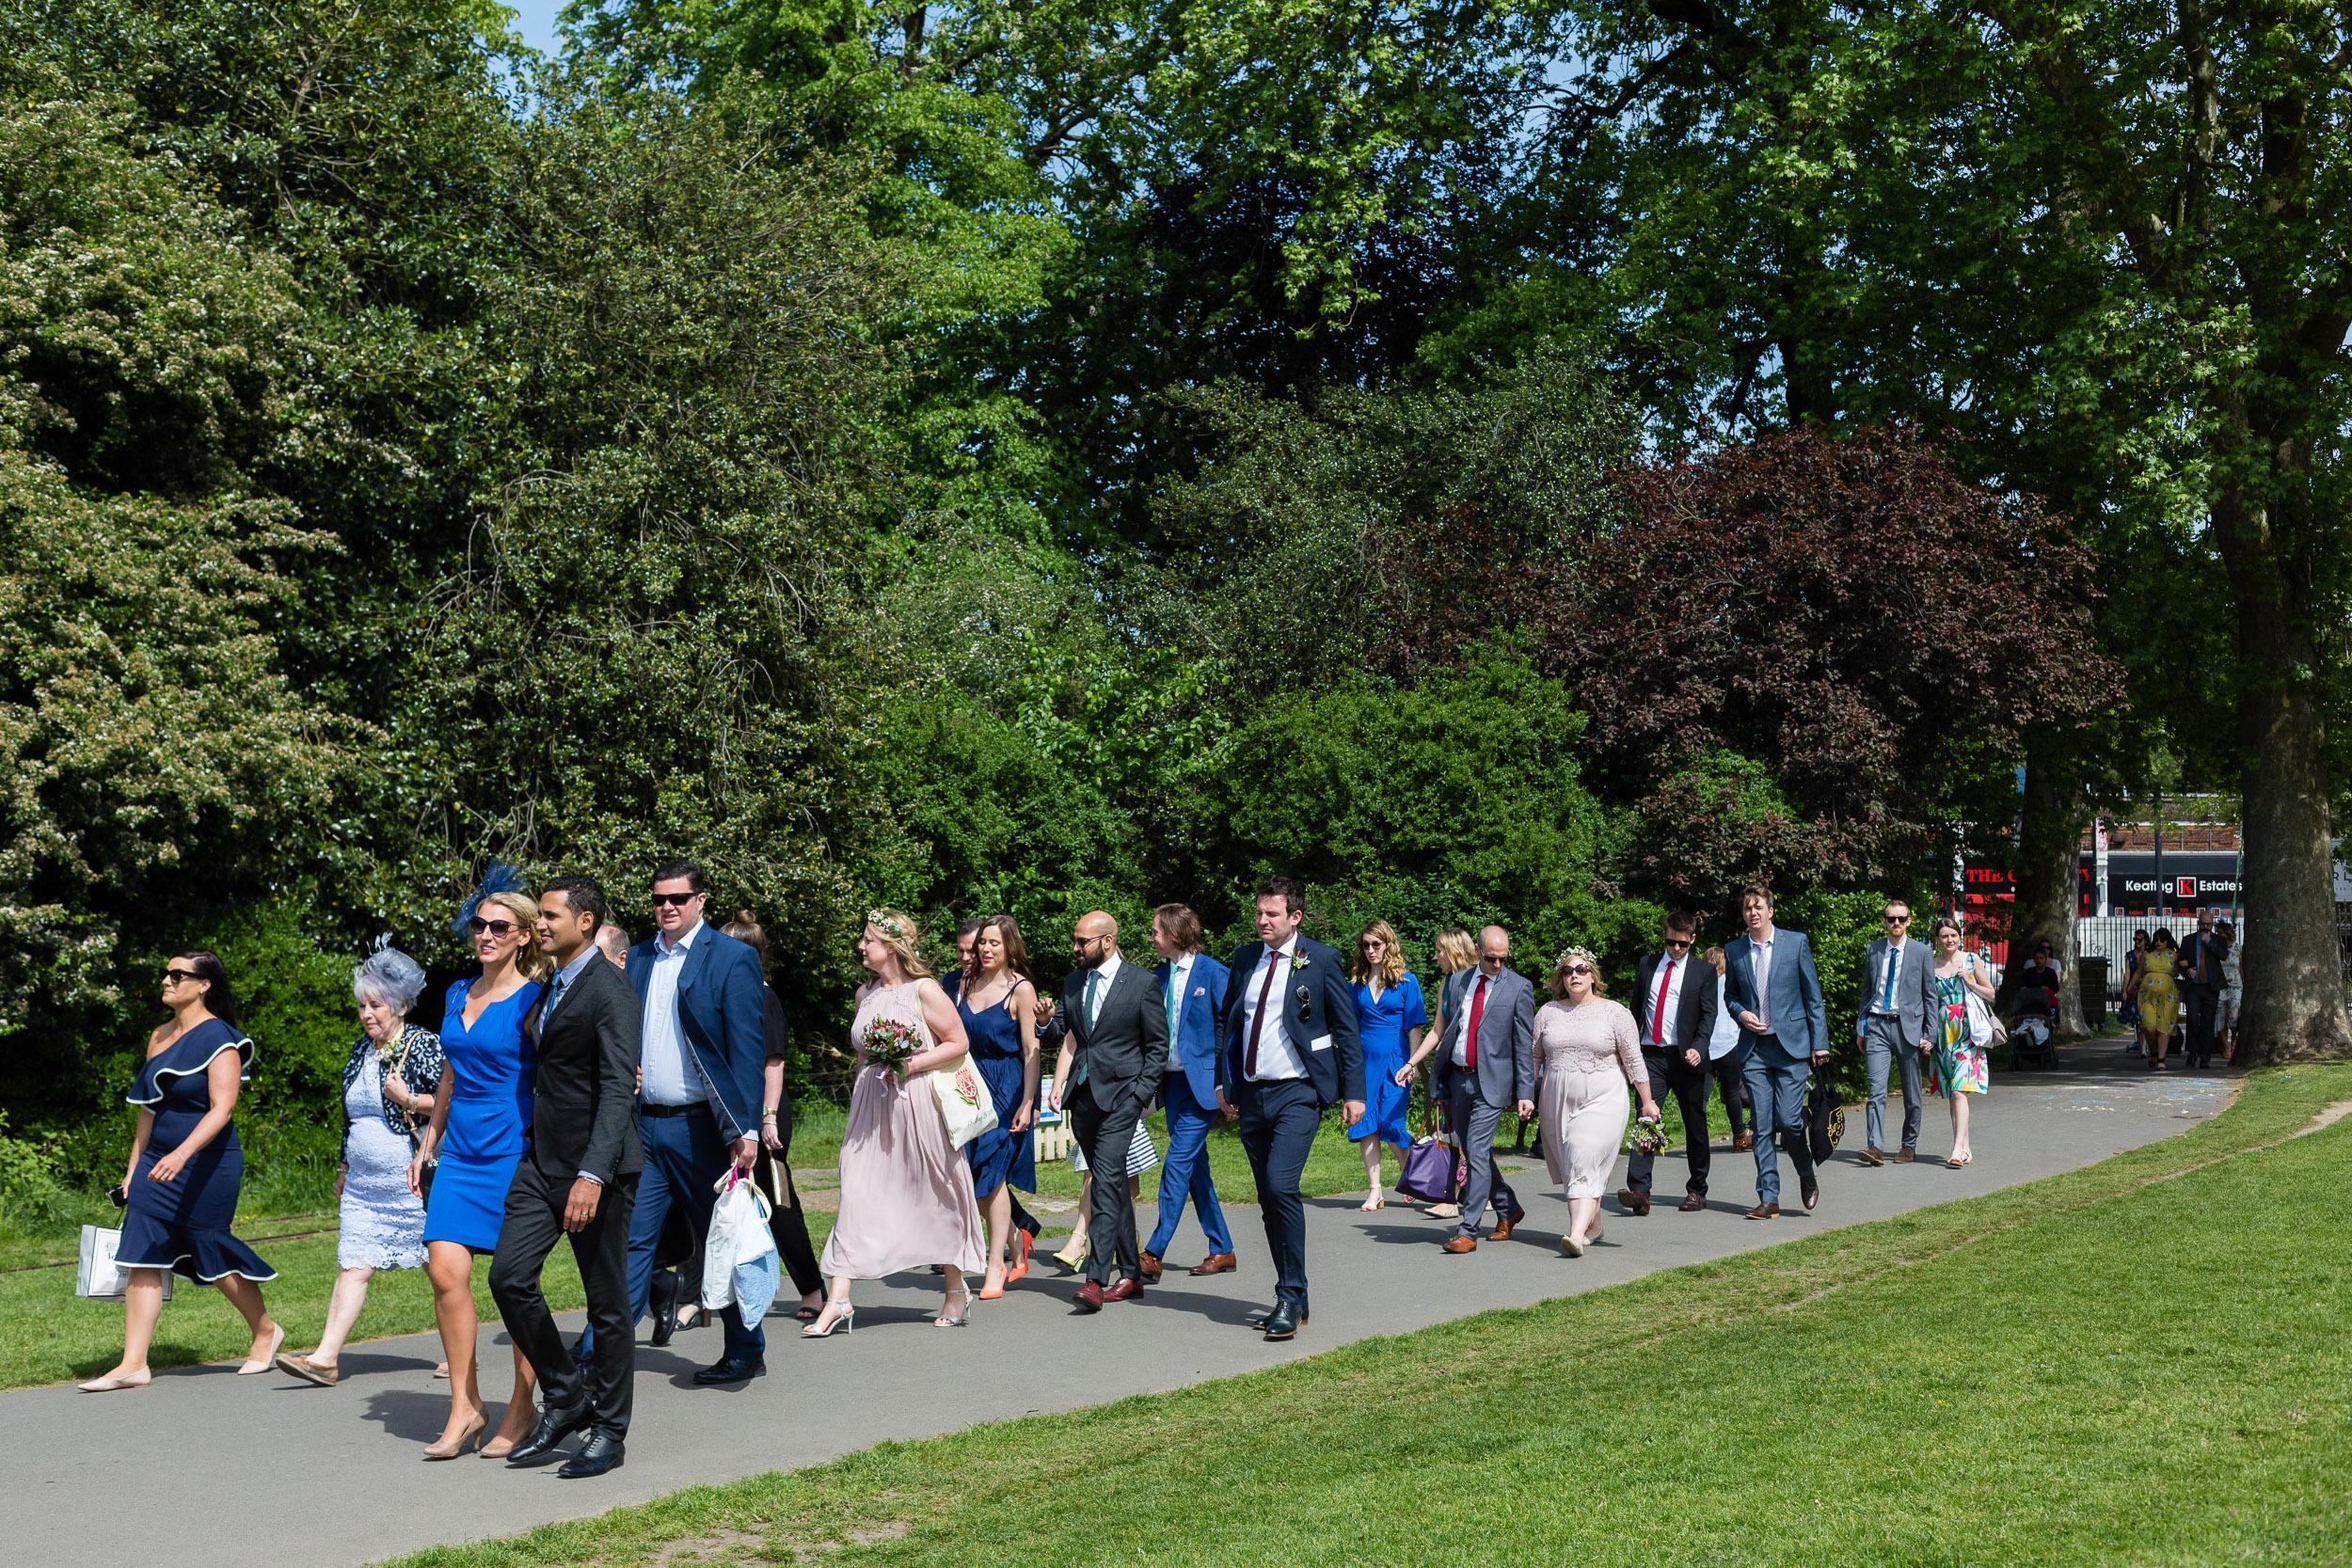 brockwell-lido-brixton-herne-hill-wedding-104.jpg